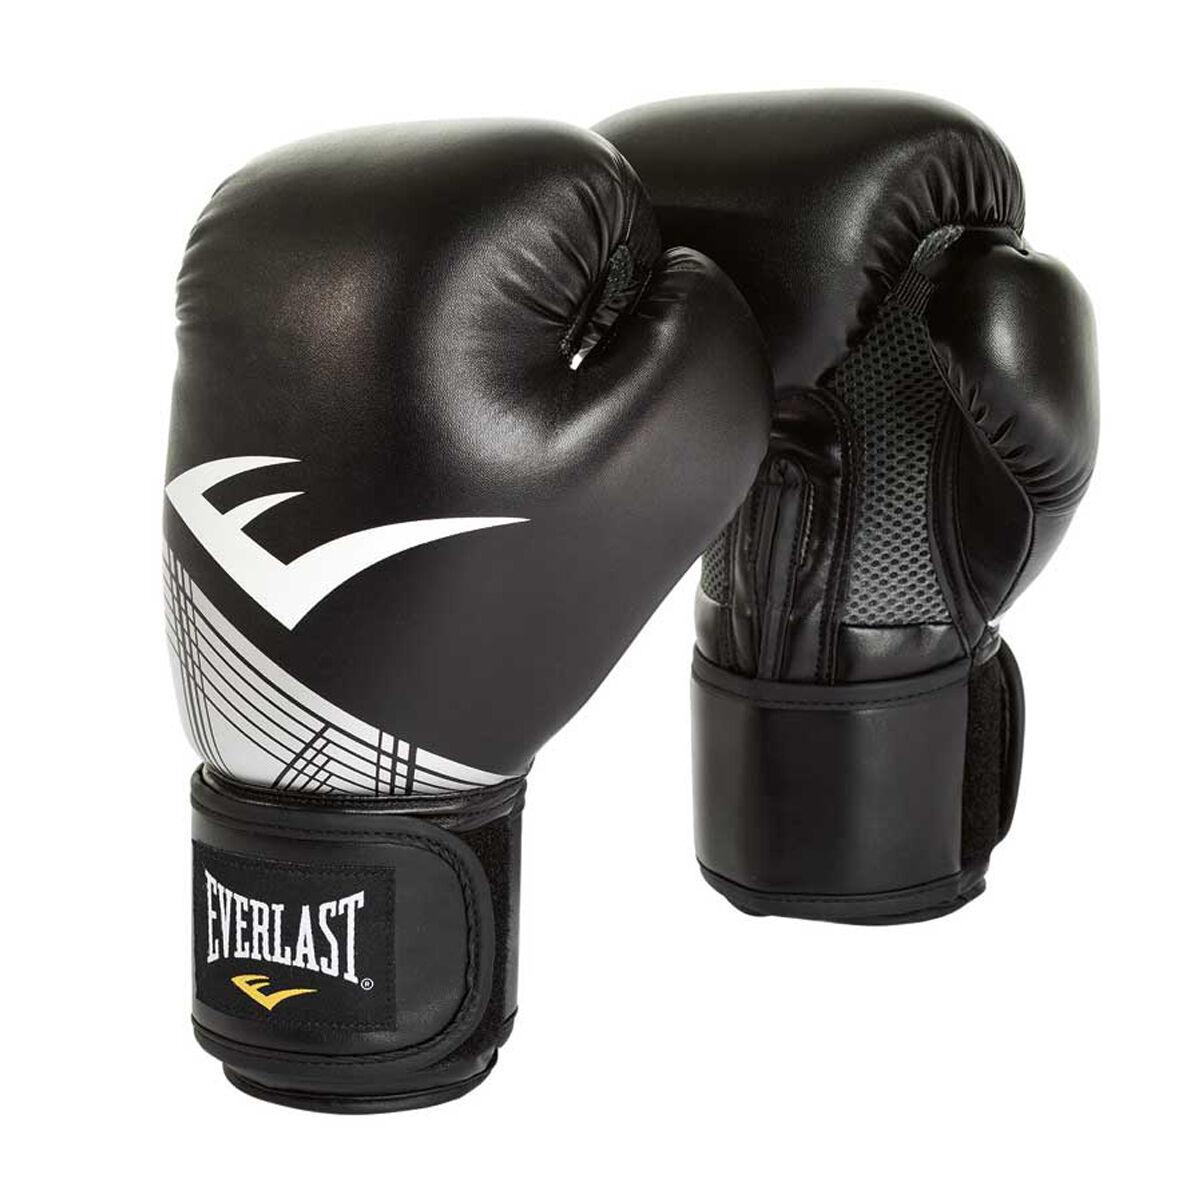 Everlast Pro Style Advanced Training Boxing Gloves Black Silver